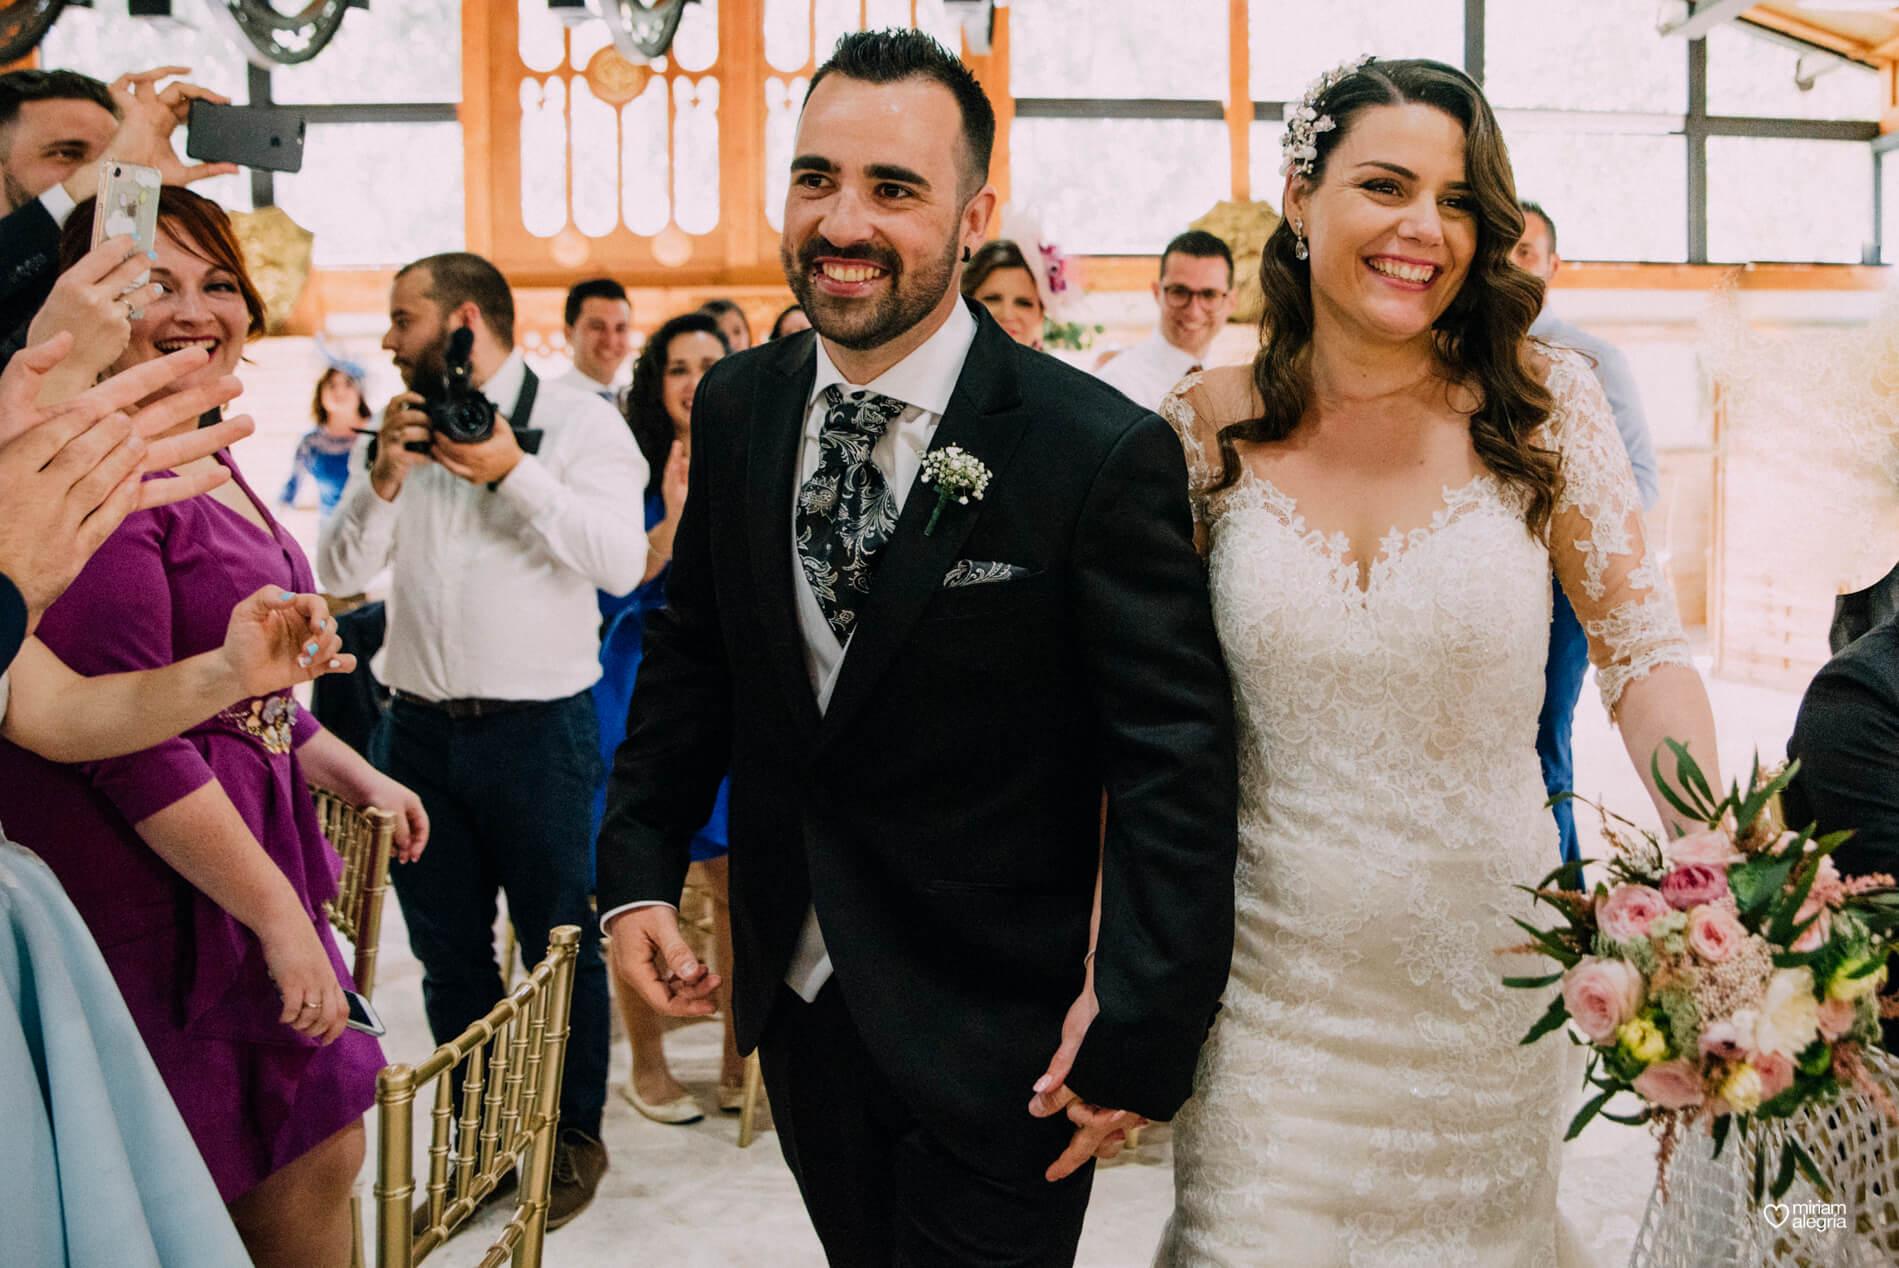 boda-en-finca-jurosa-miriam-alegria-101